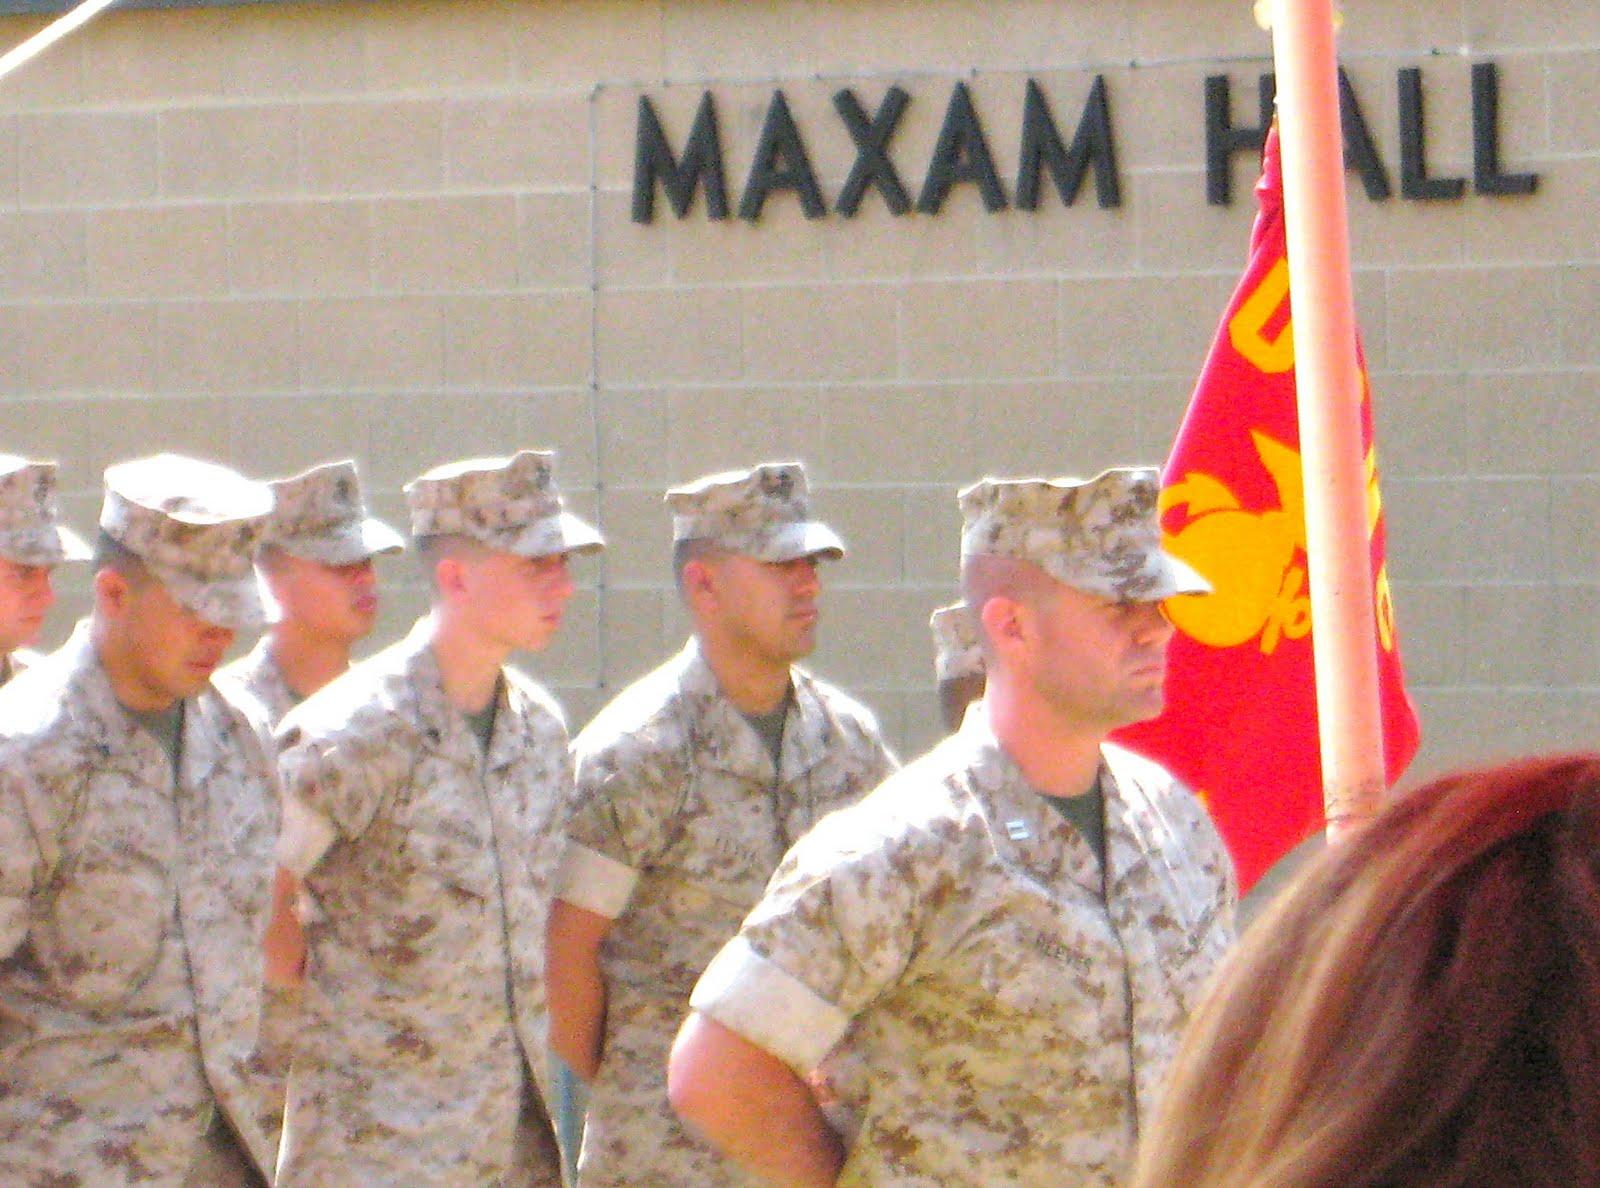 last thursday i traveled to quantico va at the invitation of the marine corps to be present for the dedication of maxam hall